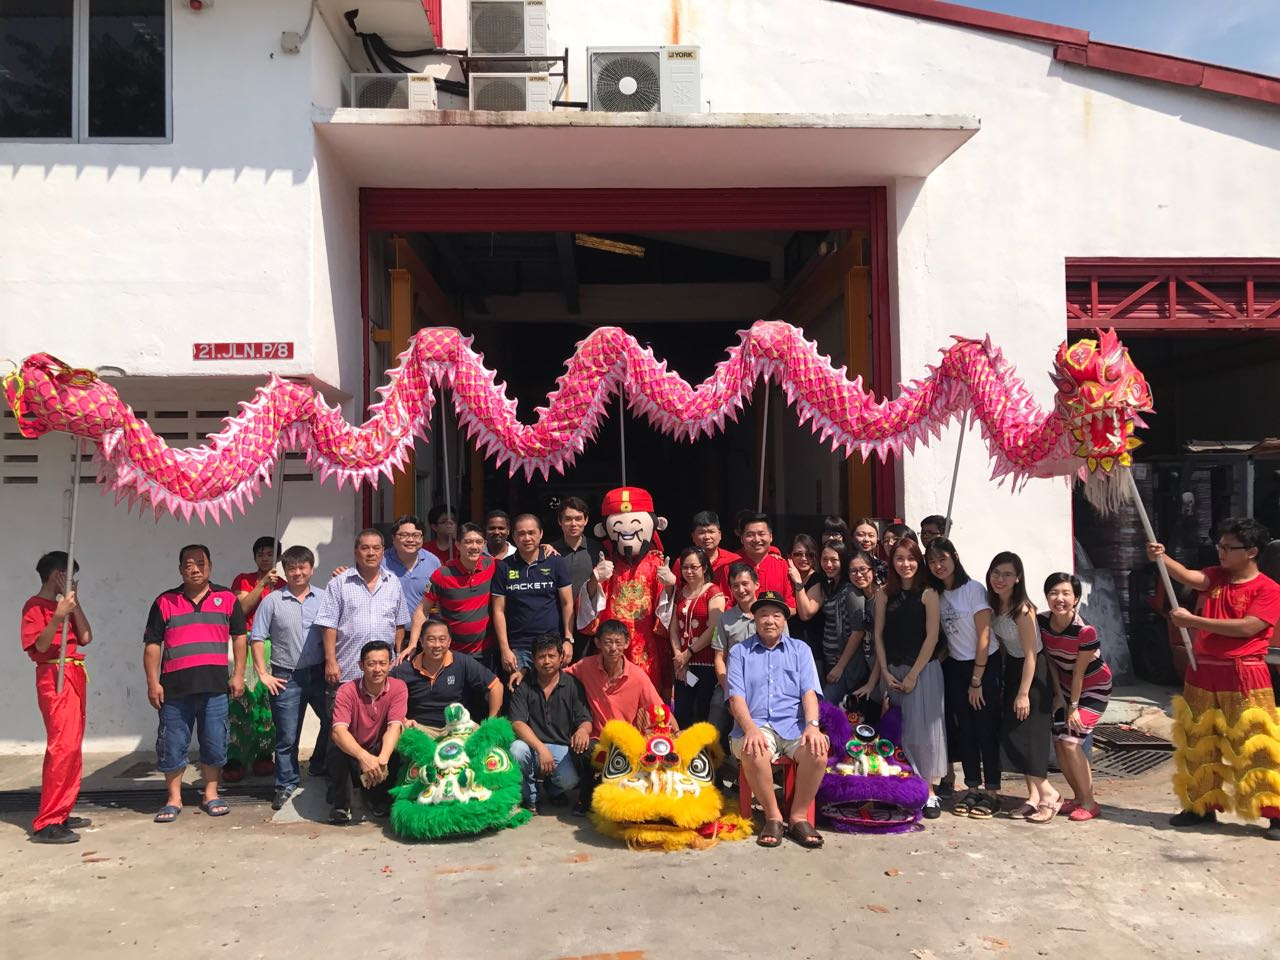 Shin Yo wish everyone a Happy Chinese New Year in 2017